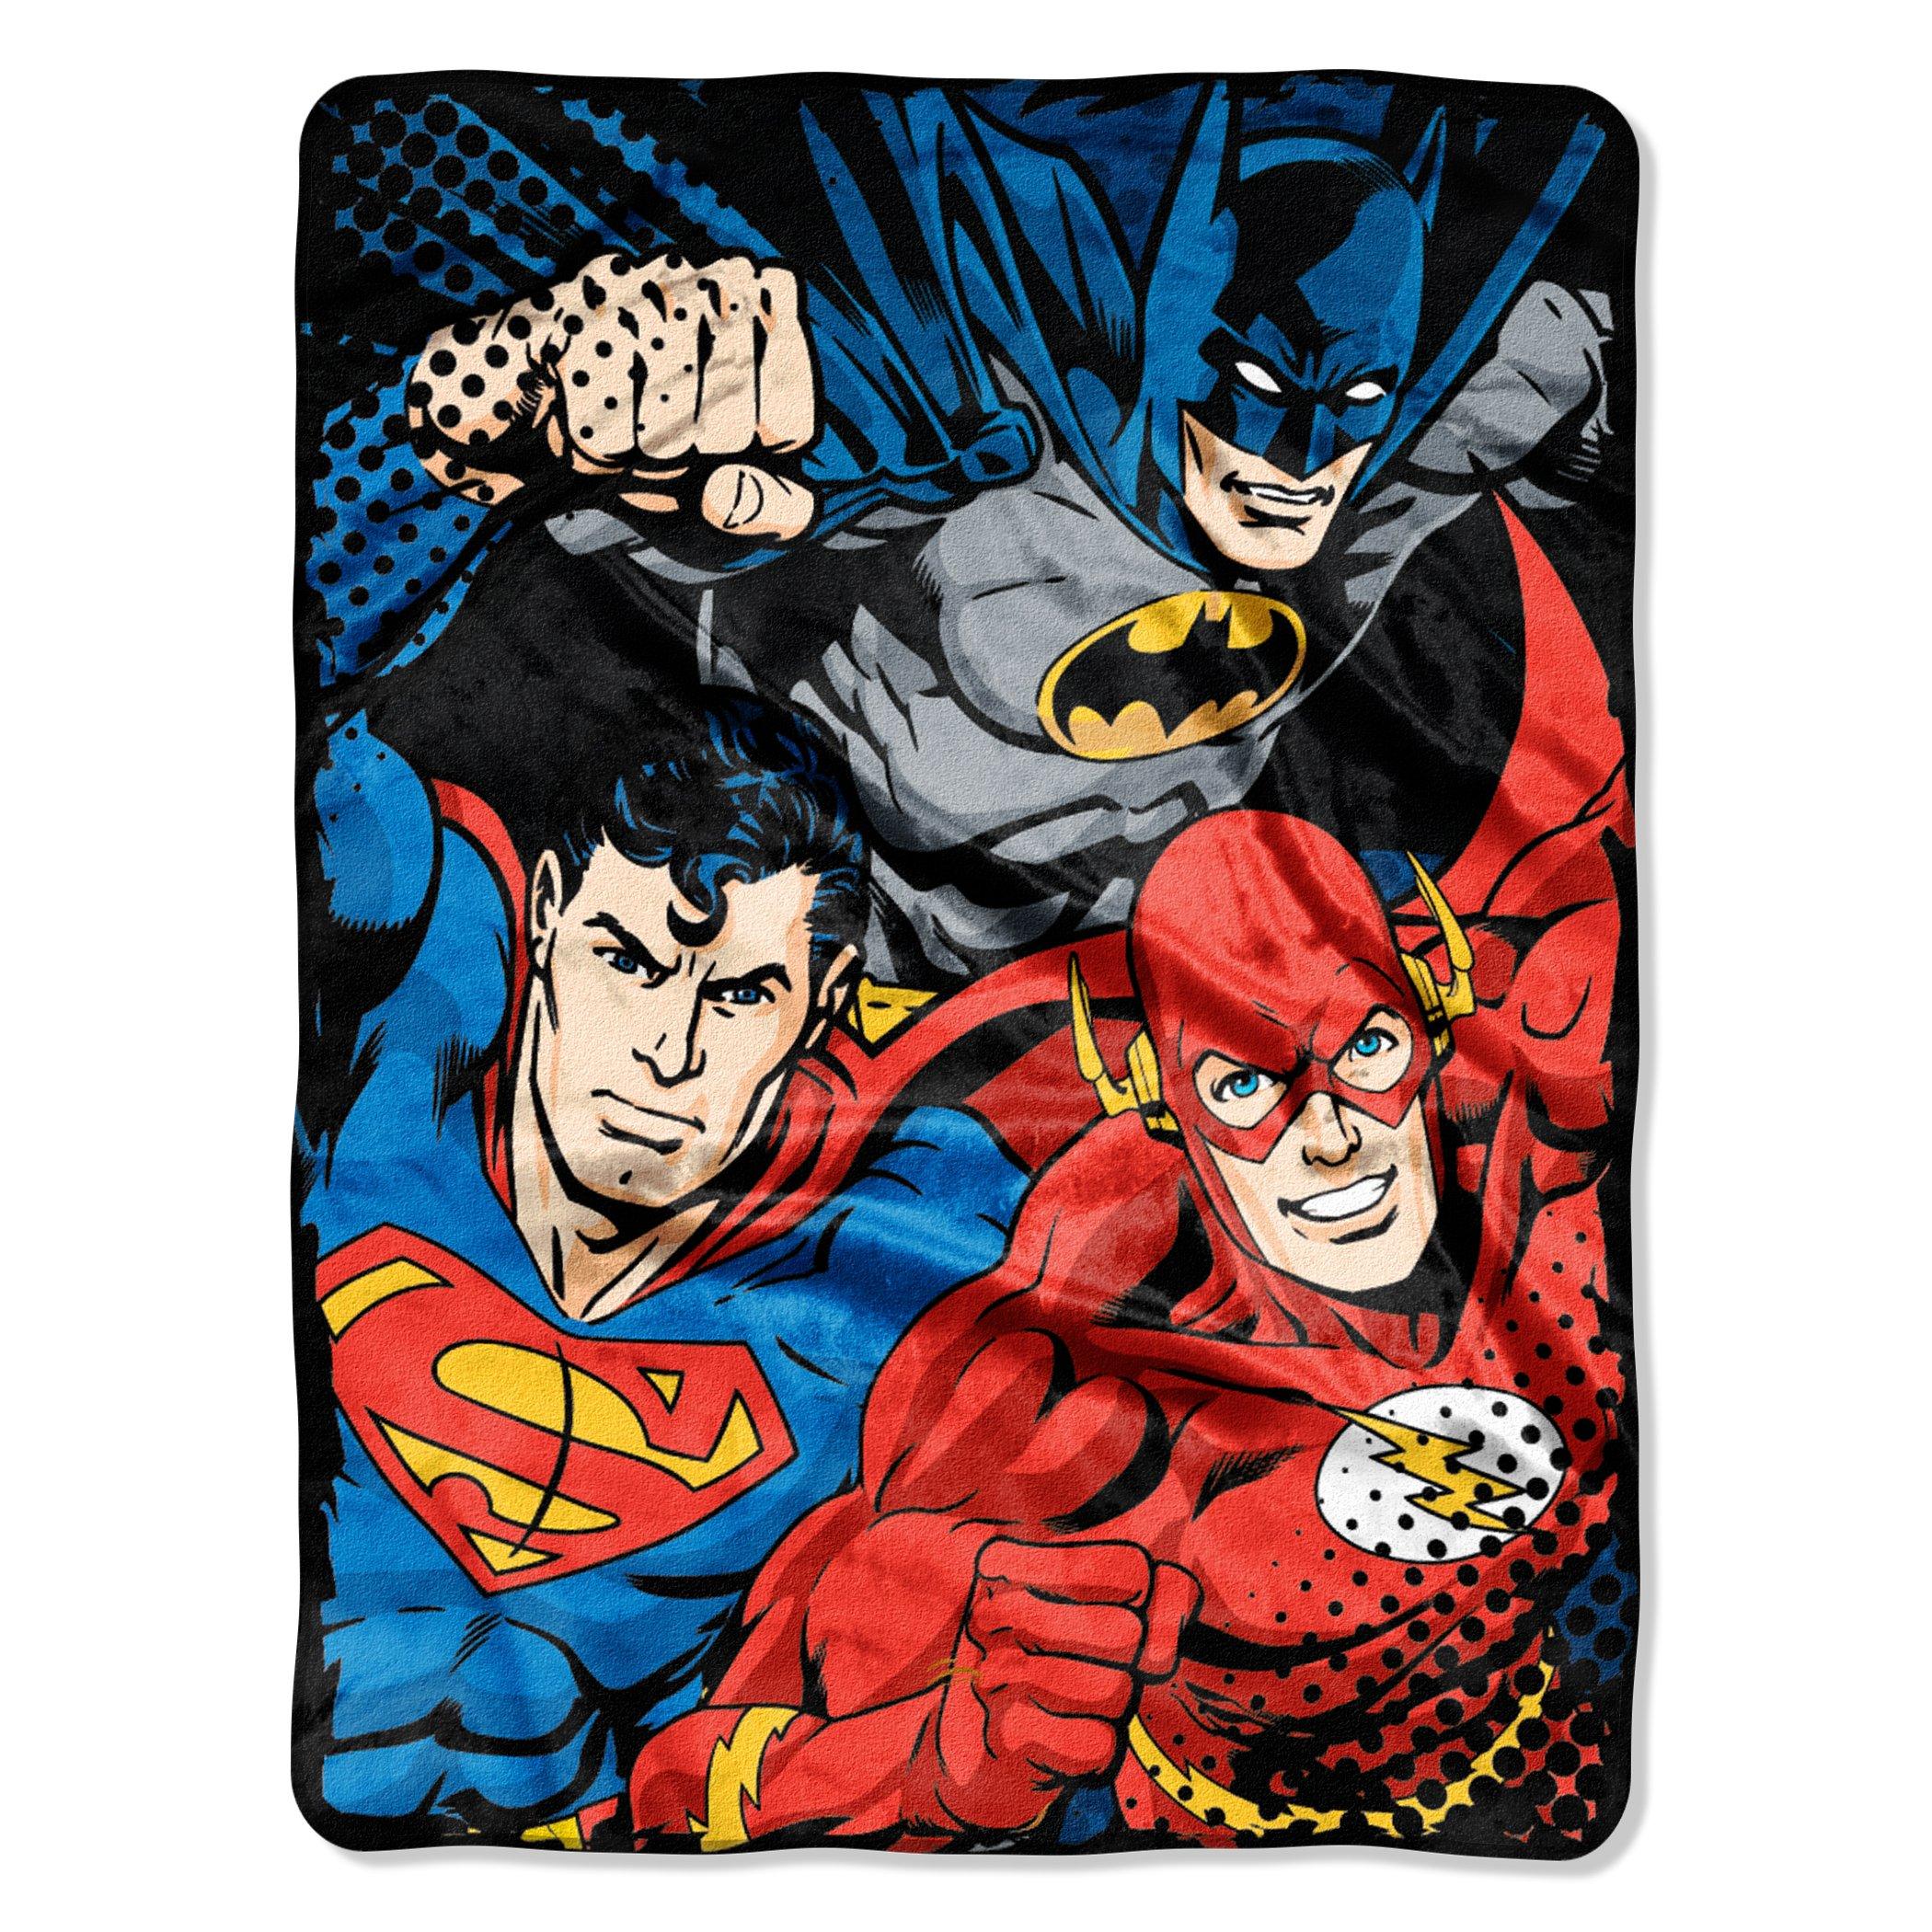 Warner Brothers DC Comics Justice League, ''League Trio'' Micro Raschel Throw Blanket, 46'' x 60'', Multi Color